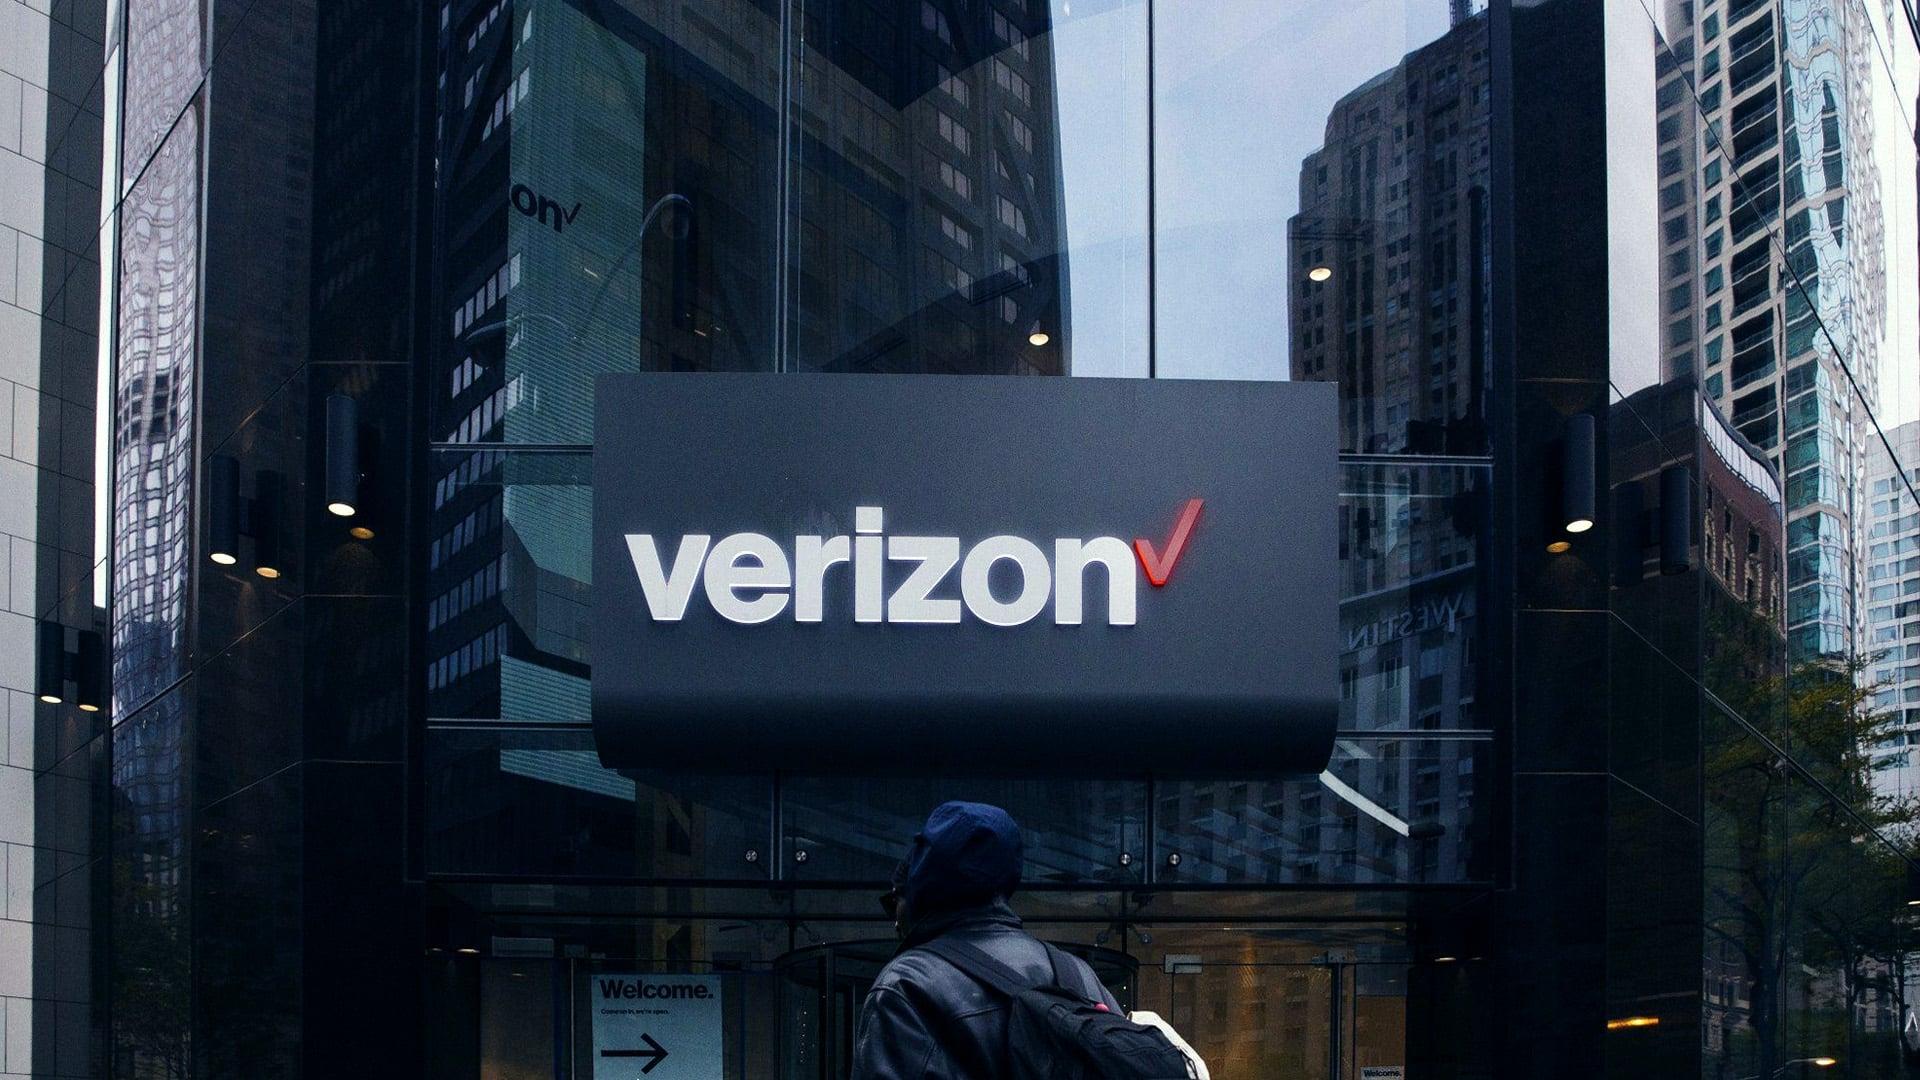 Verizon sells media assets including Yahoo, AOL units to Apollo for 5 billion USD